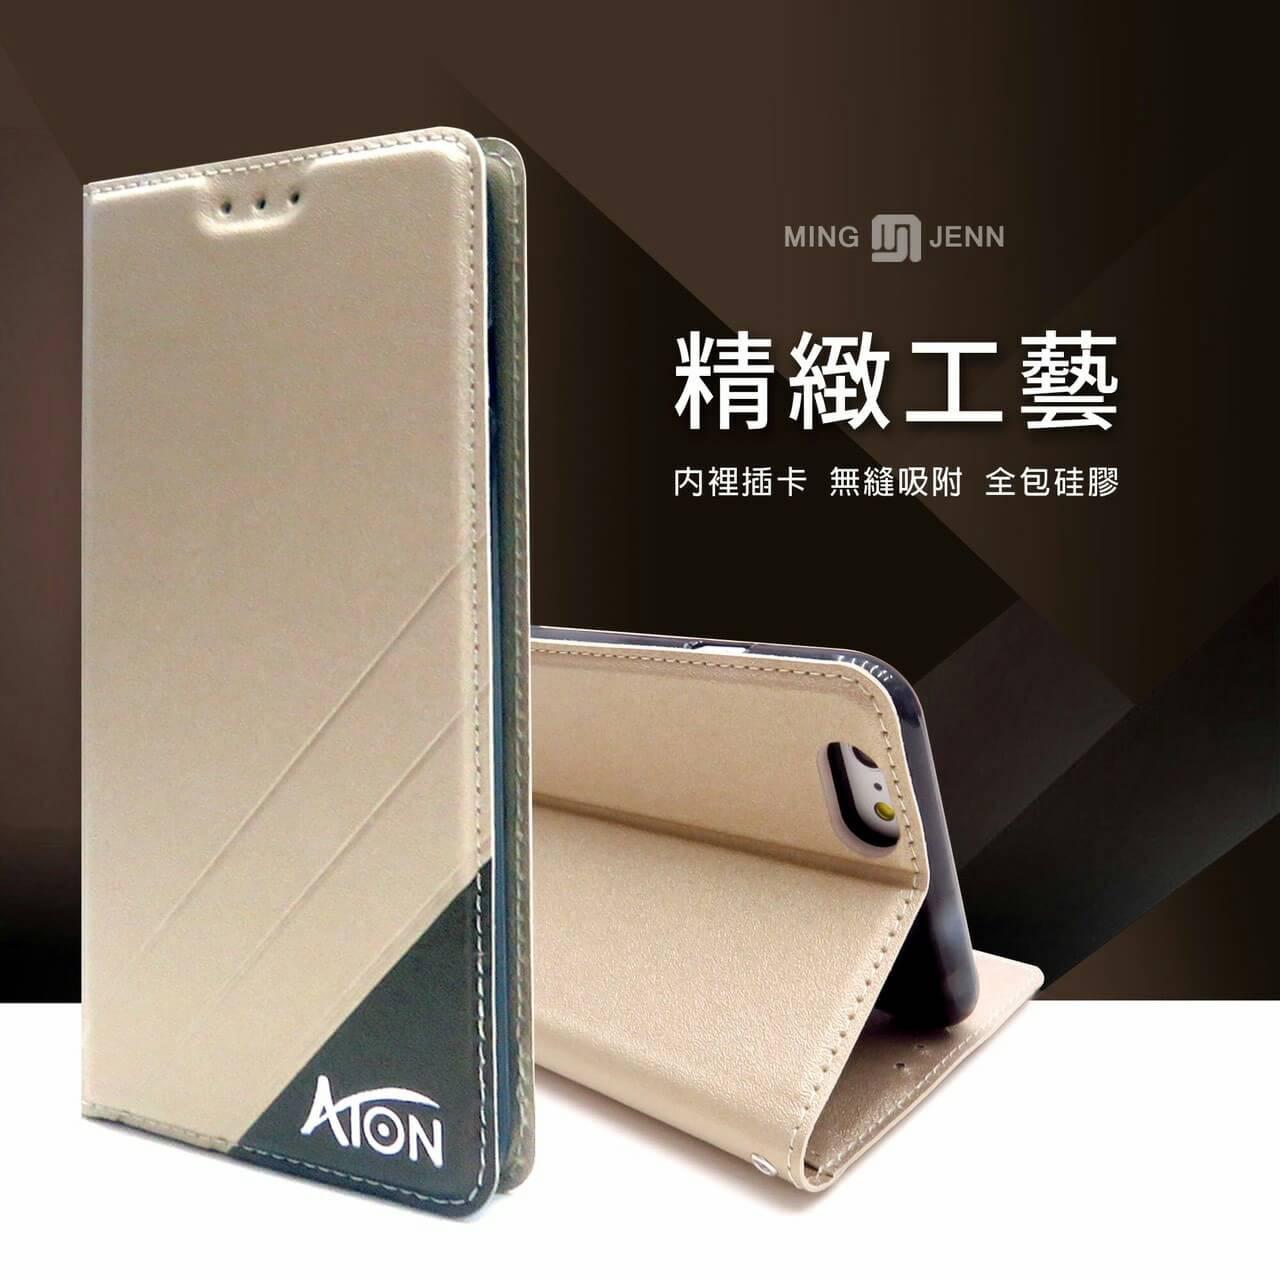 ATON 鐵塔系列 SAMSUNG Galaxy A20 手機皮套 隱扣 側翻皮套 可立式 可插卡 含內袋 手機套 保護殼 保護套